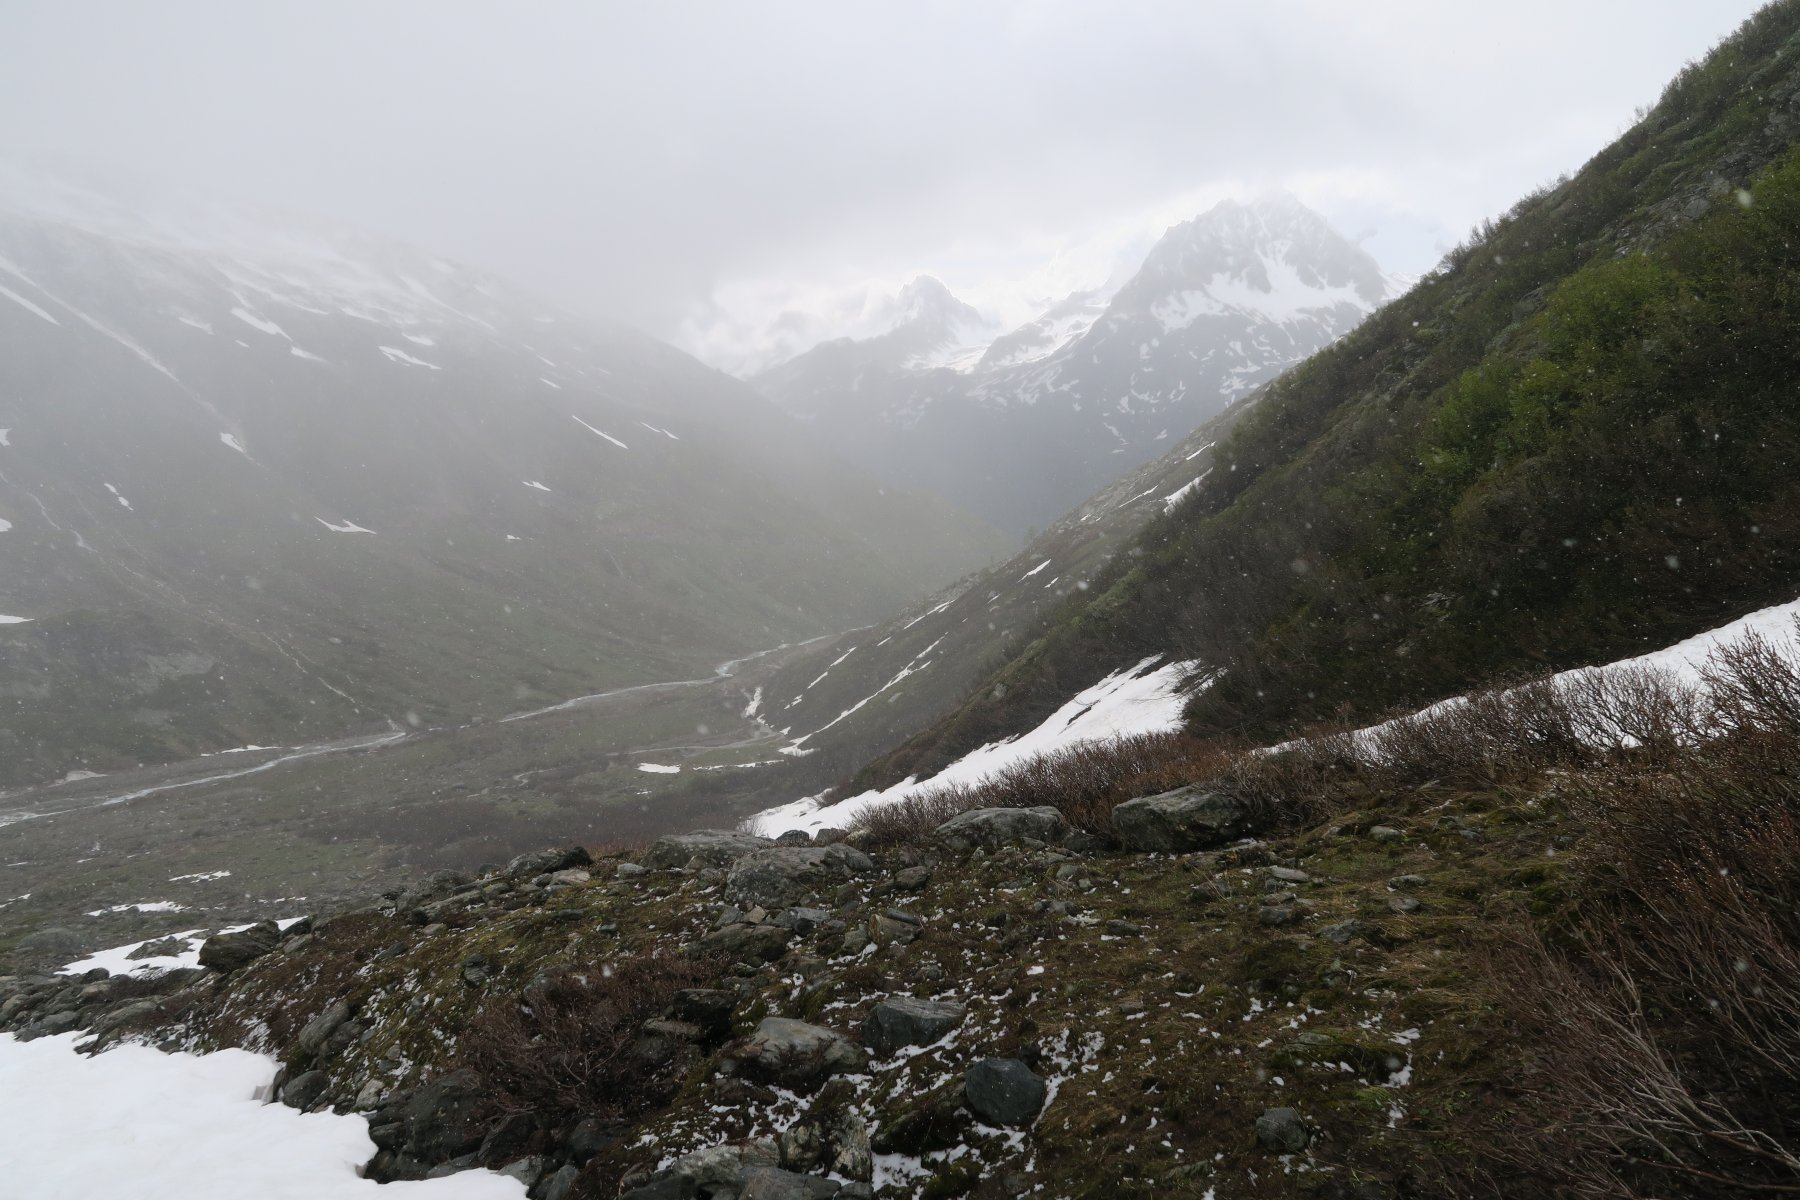 leggera spruzzata di neve già in basso